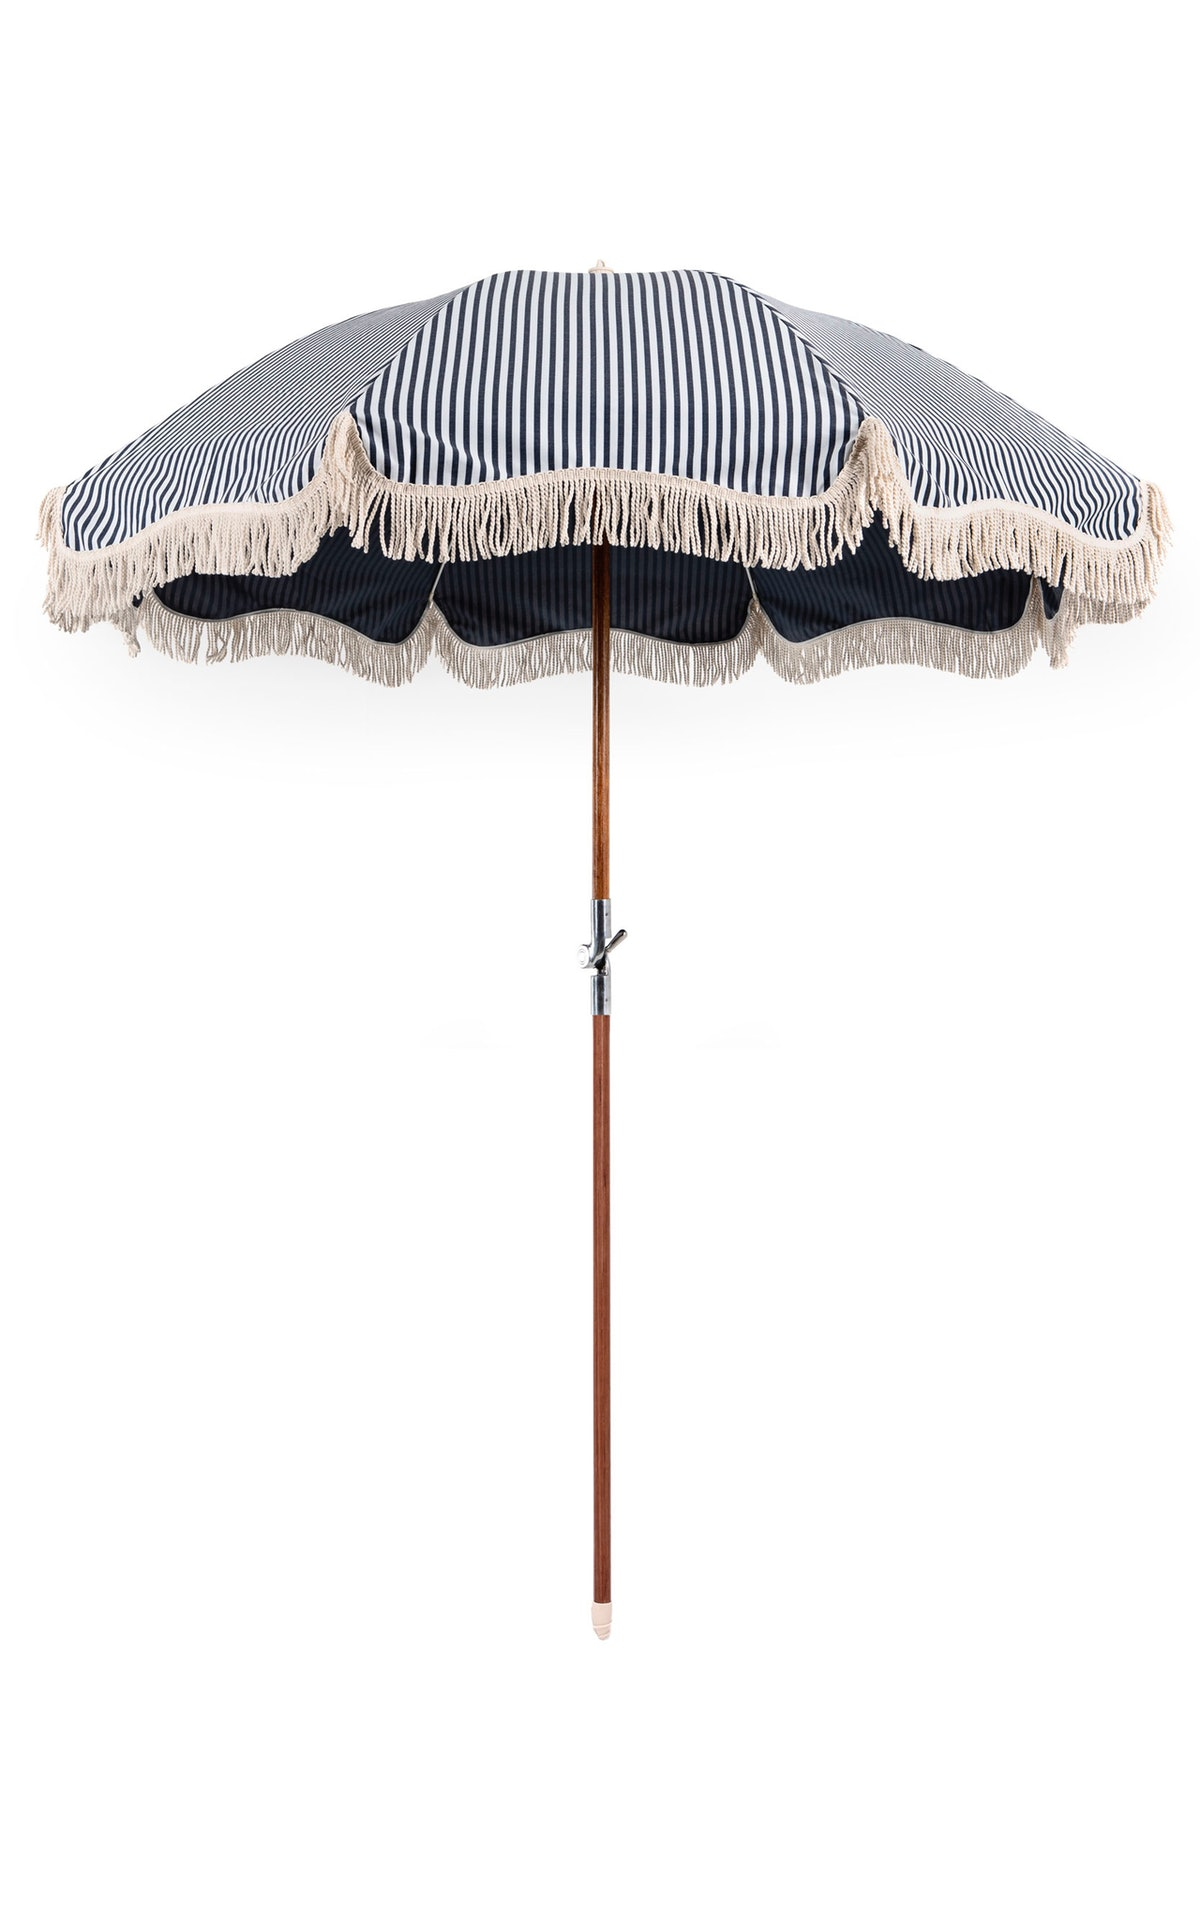 The Premium Beach Umbrella - Lauren's Navy Stripe